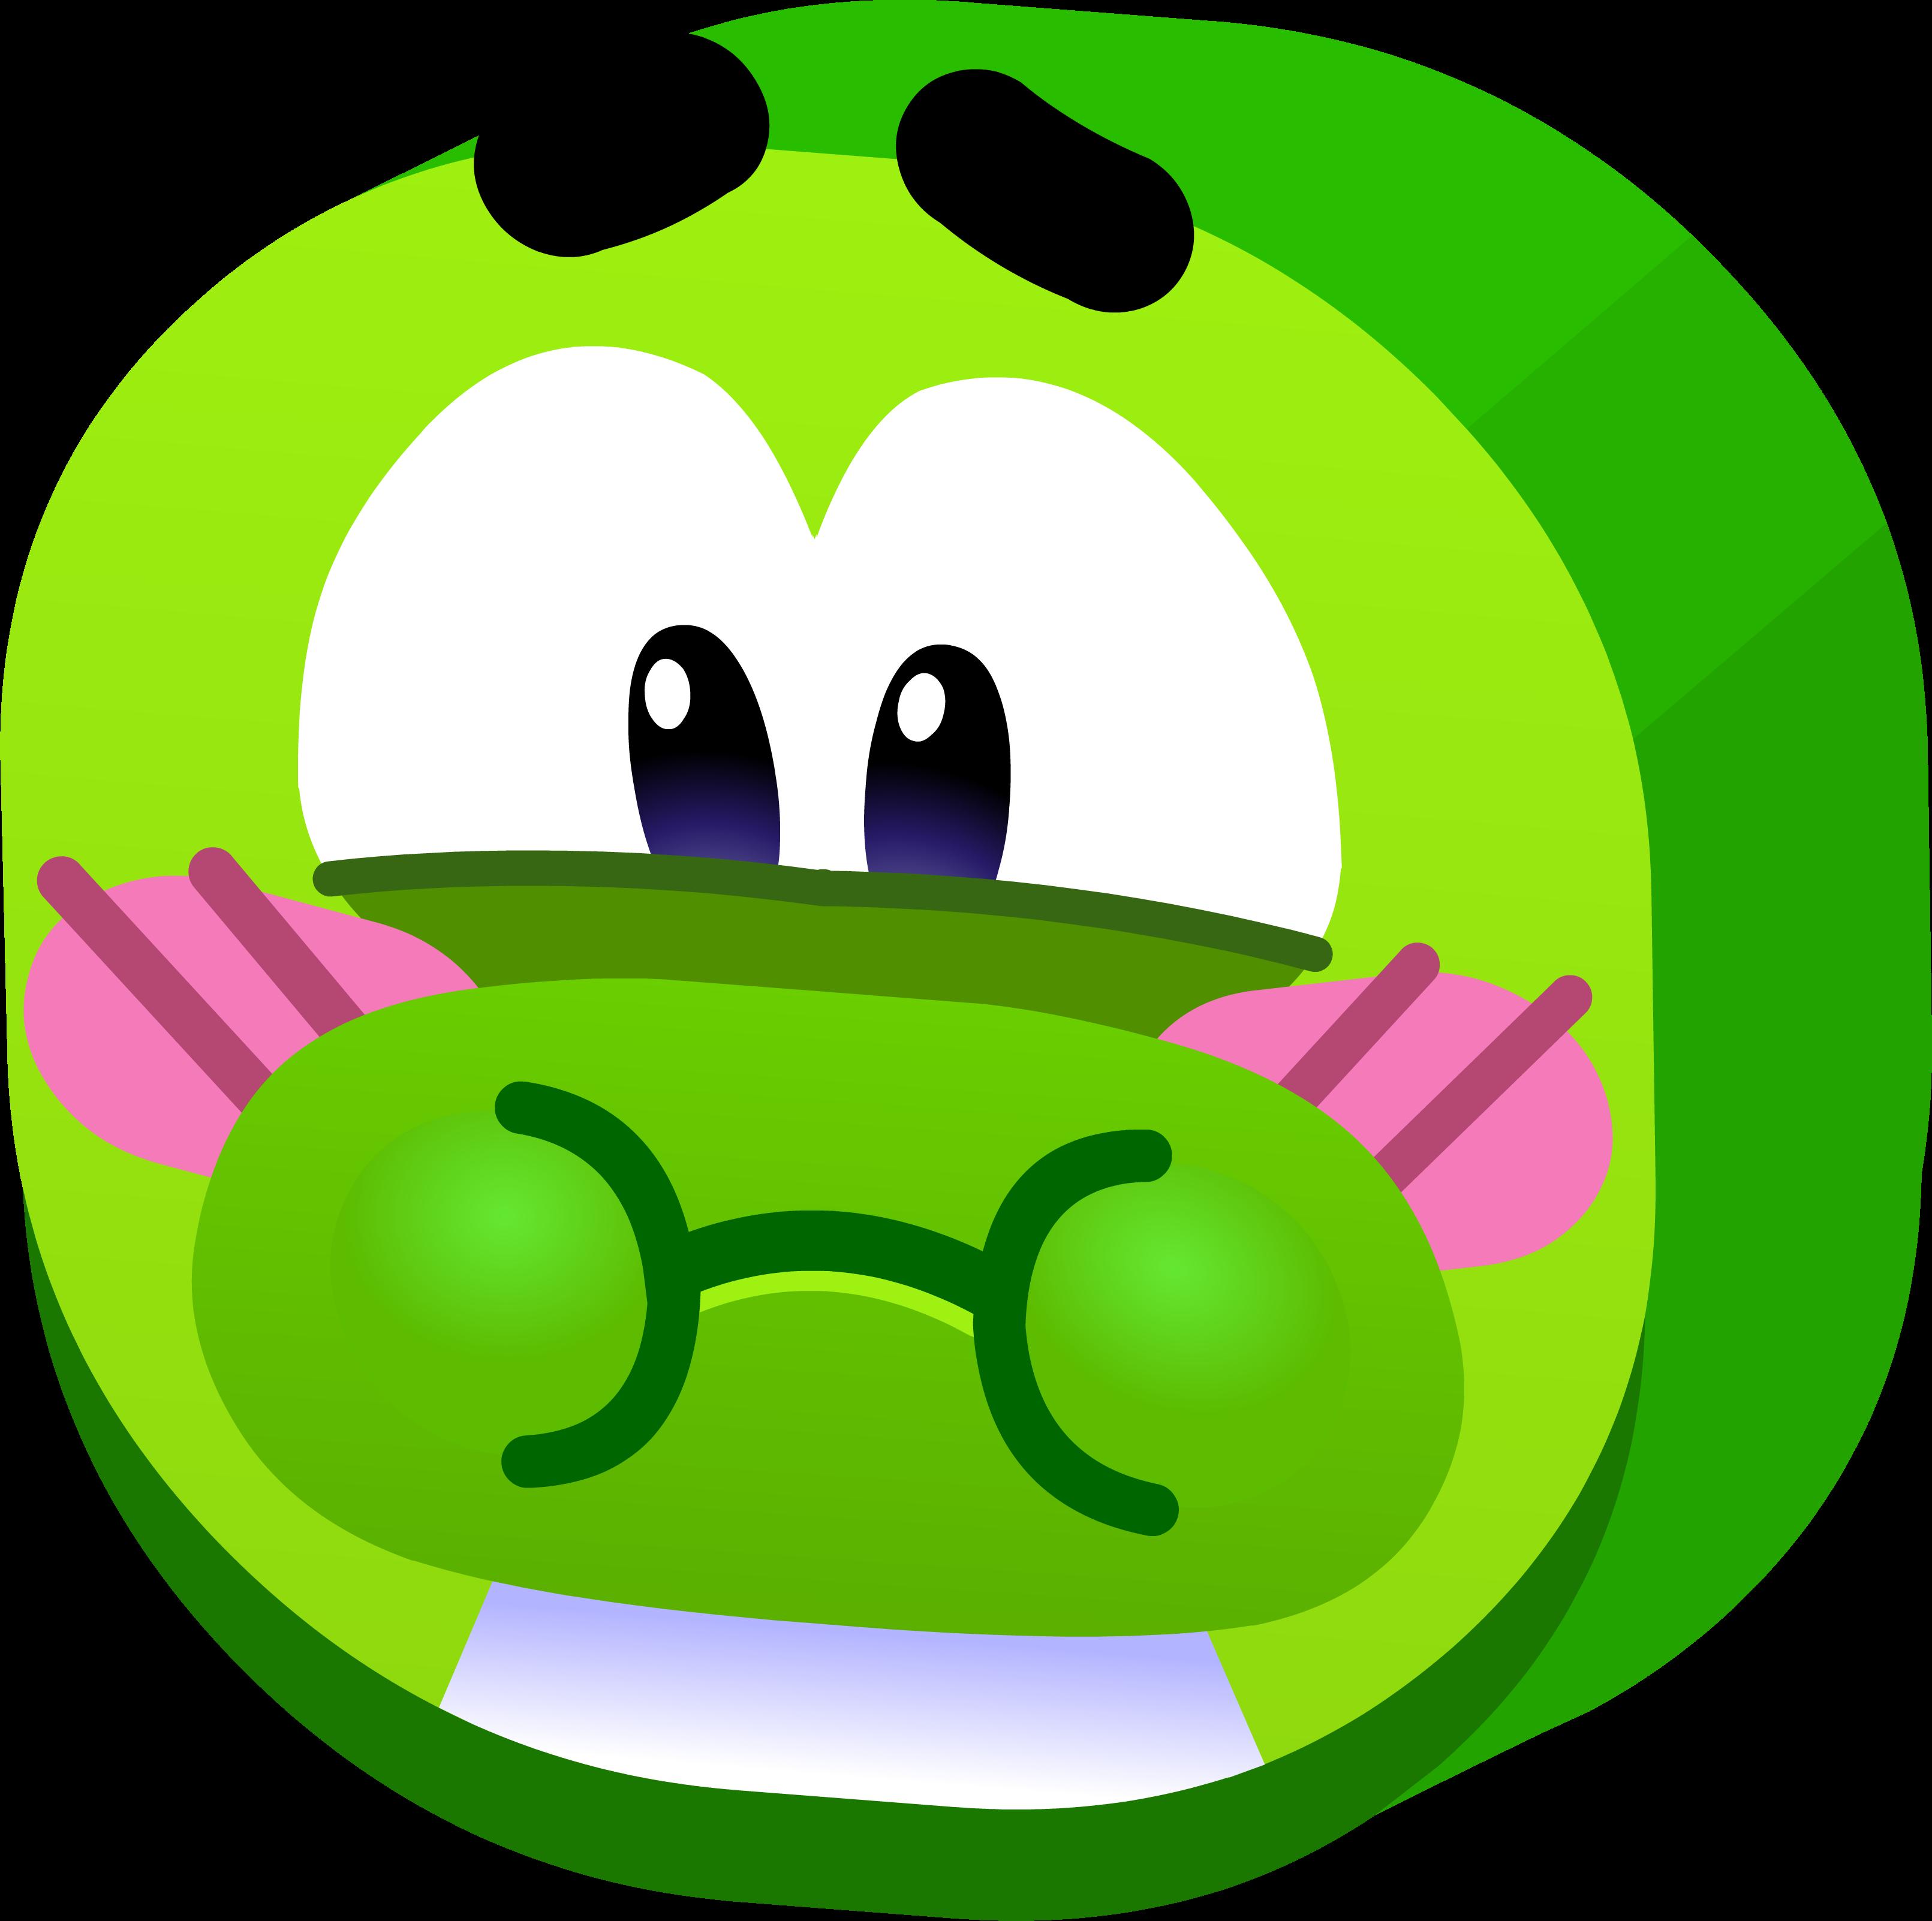 Image cpi party plaza. Emoji clipart frog